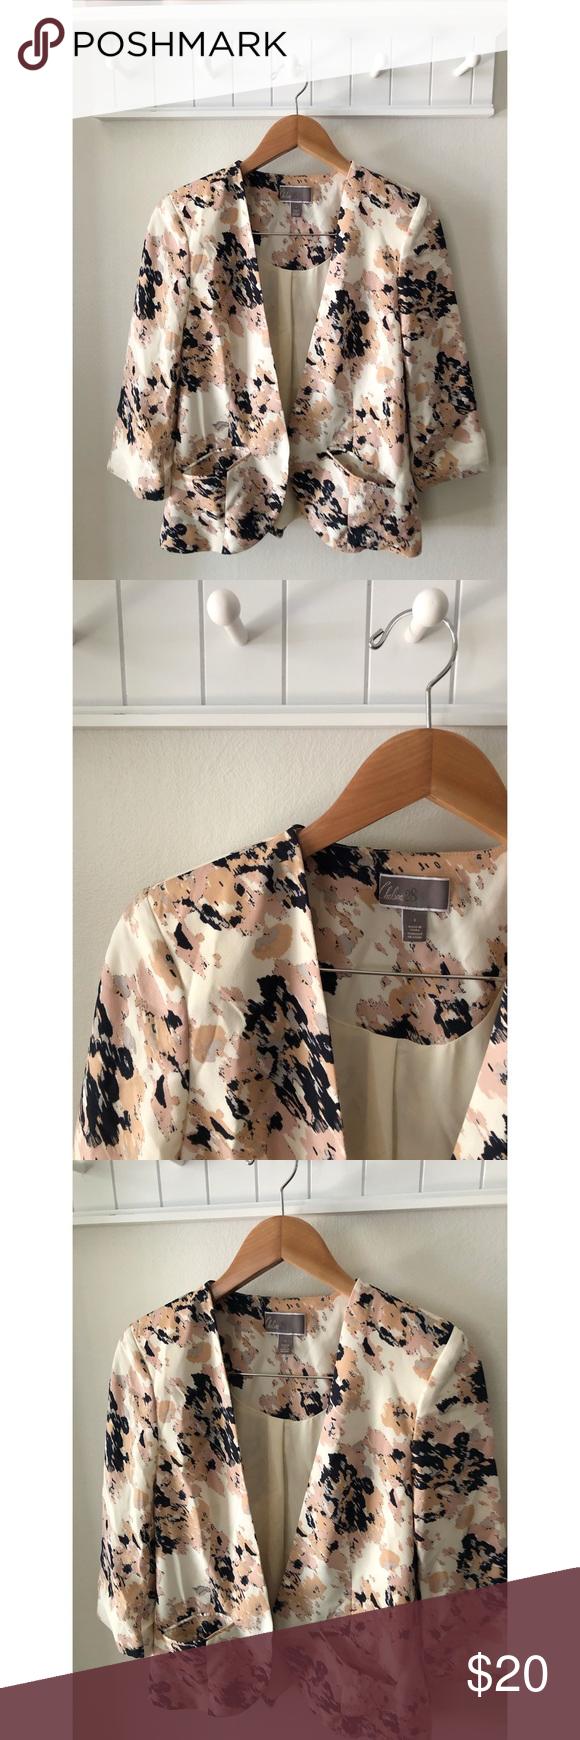 Chelsea28 Floral Blazer Beautiful color palette Nordstrom blazer EUC. Chelsea28 Jackets & Coats Blazers #myposhpicks